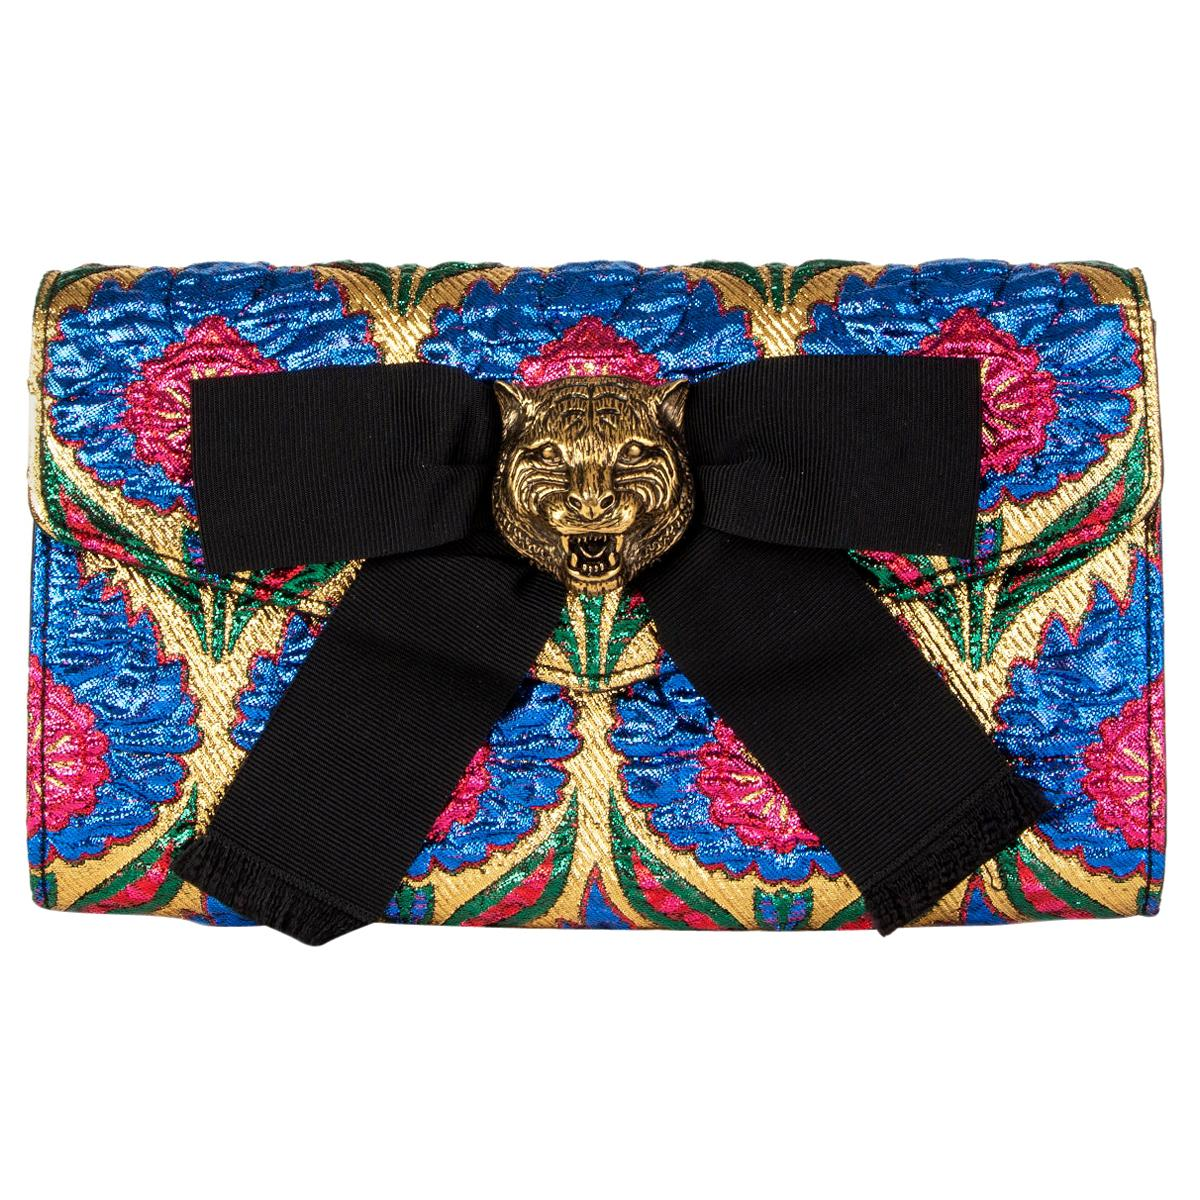 GUCCI blue gold ANIMALIER BROADWAY BROCADE Clutch Bag